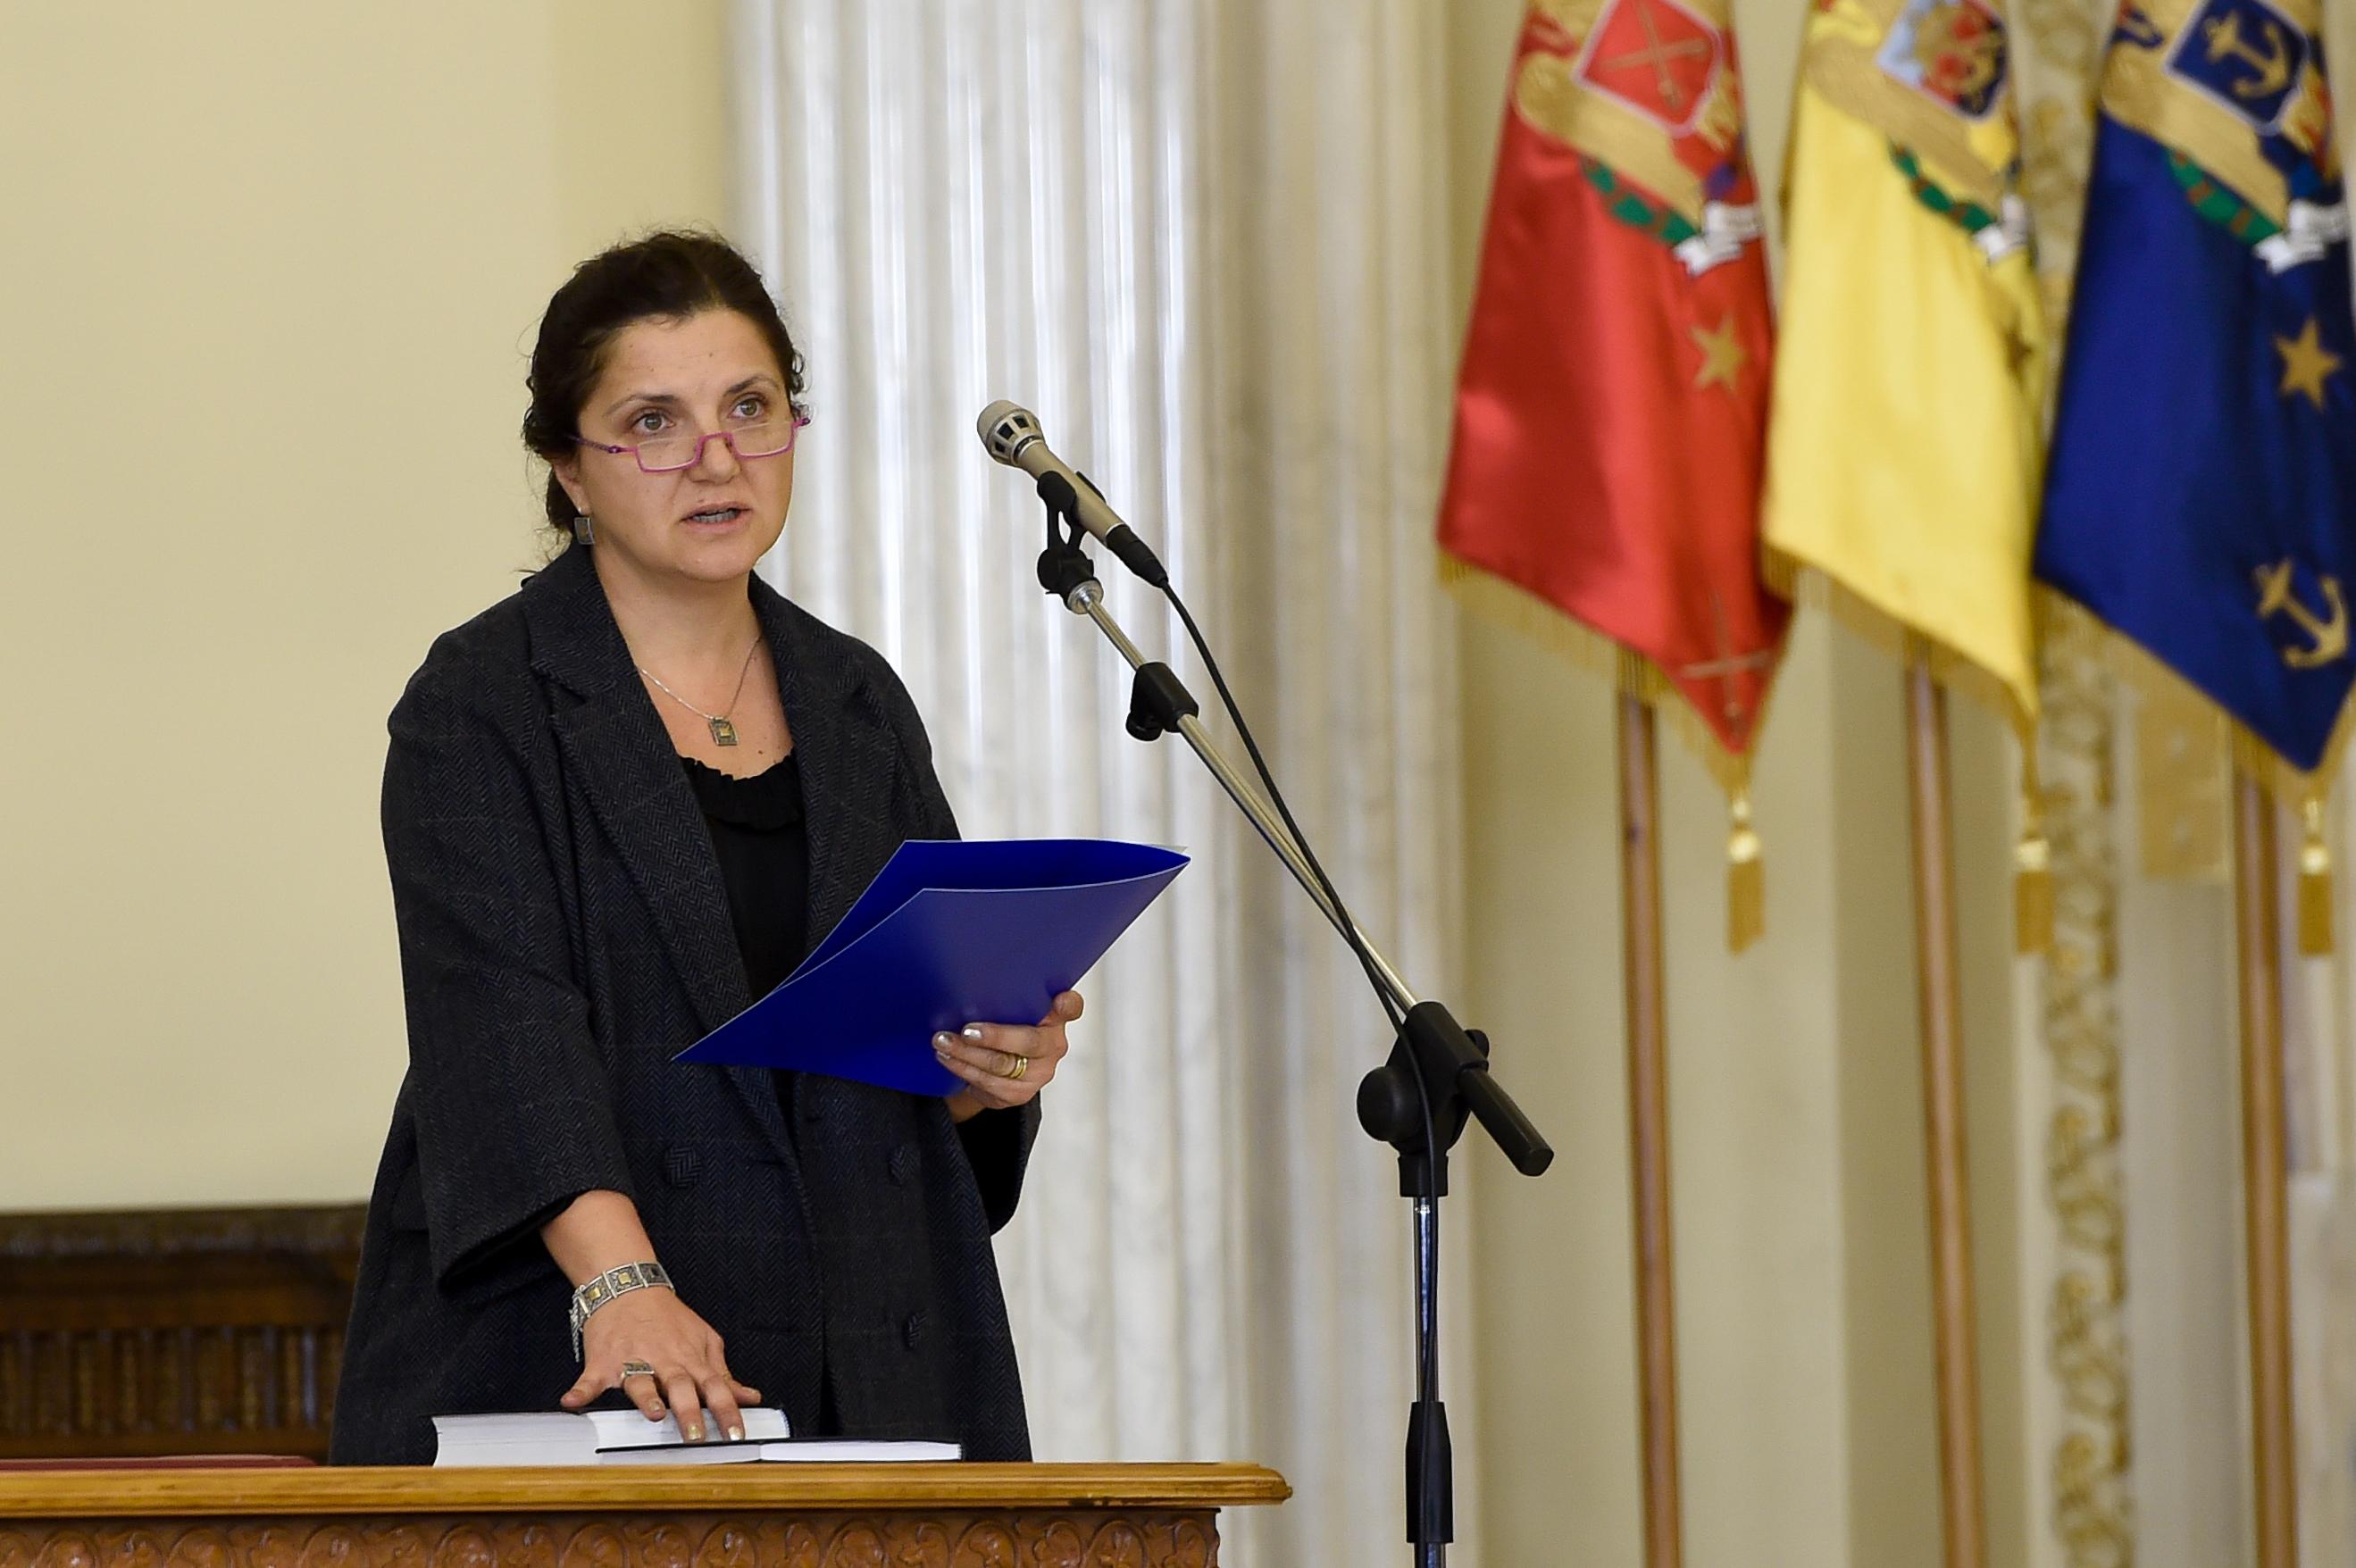 Cui i-a cerut demisia ministrul Justitiei, Raluca Pruna.